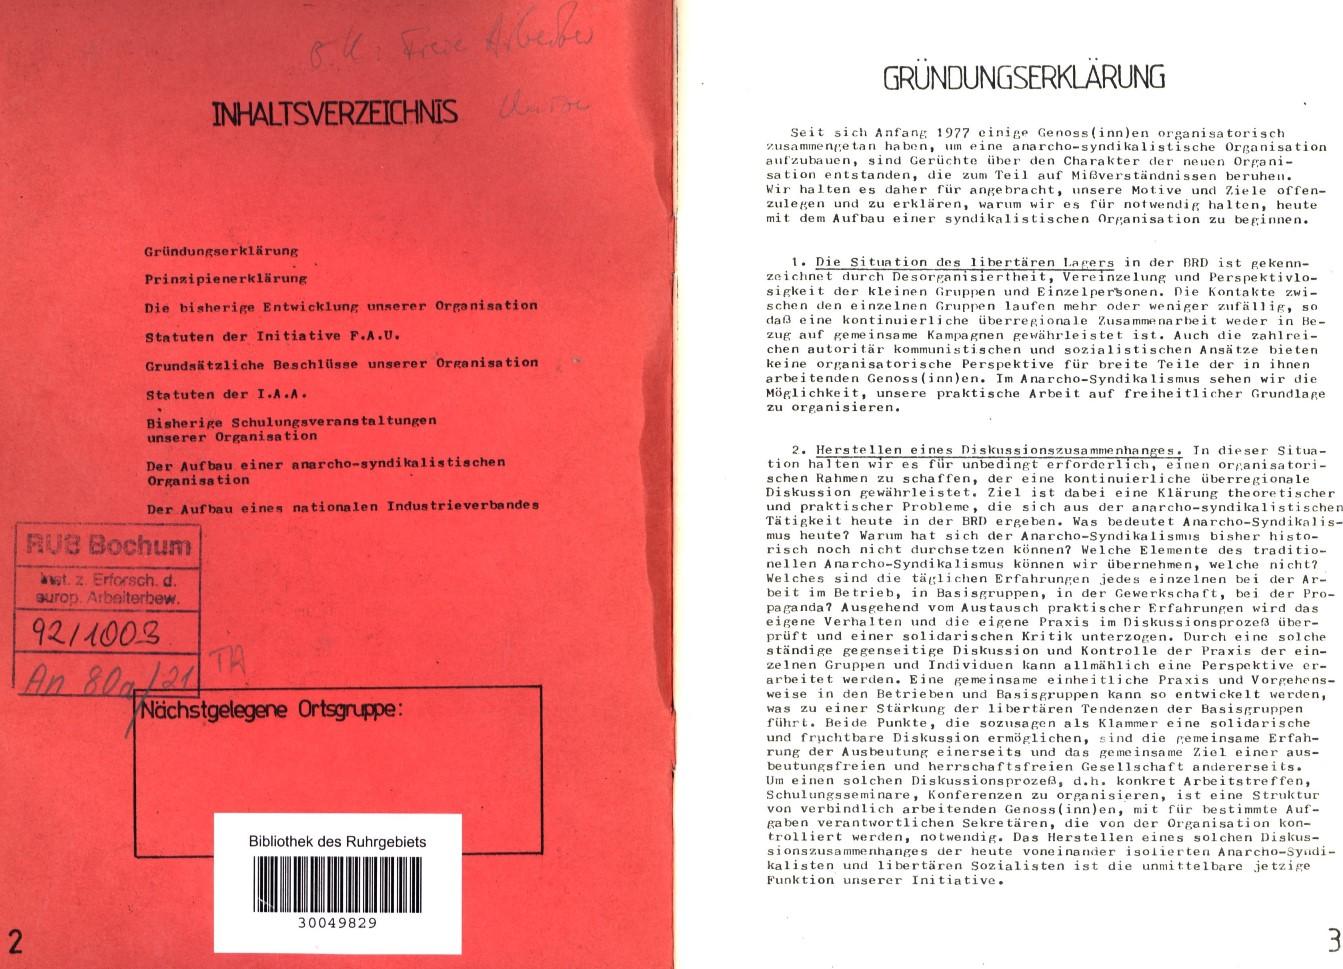 FAU_1979_Arbeitsgrundlage_02